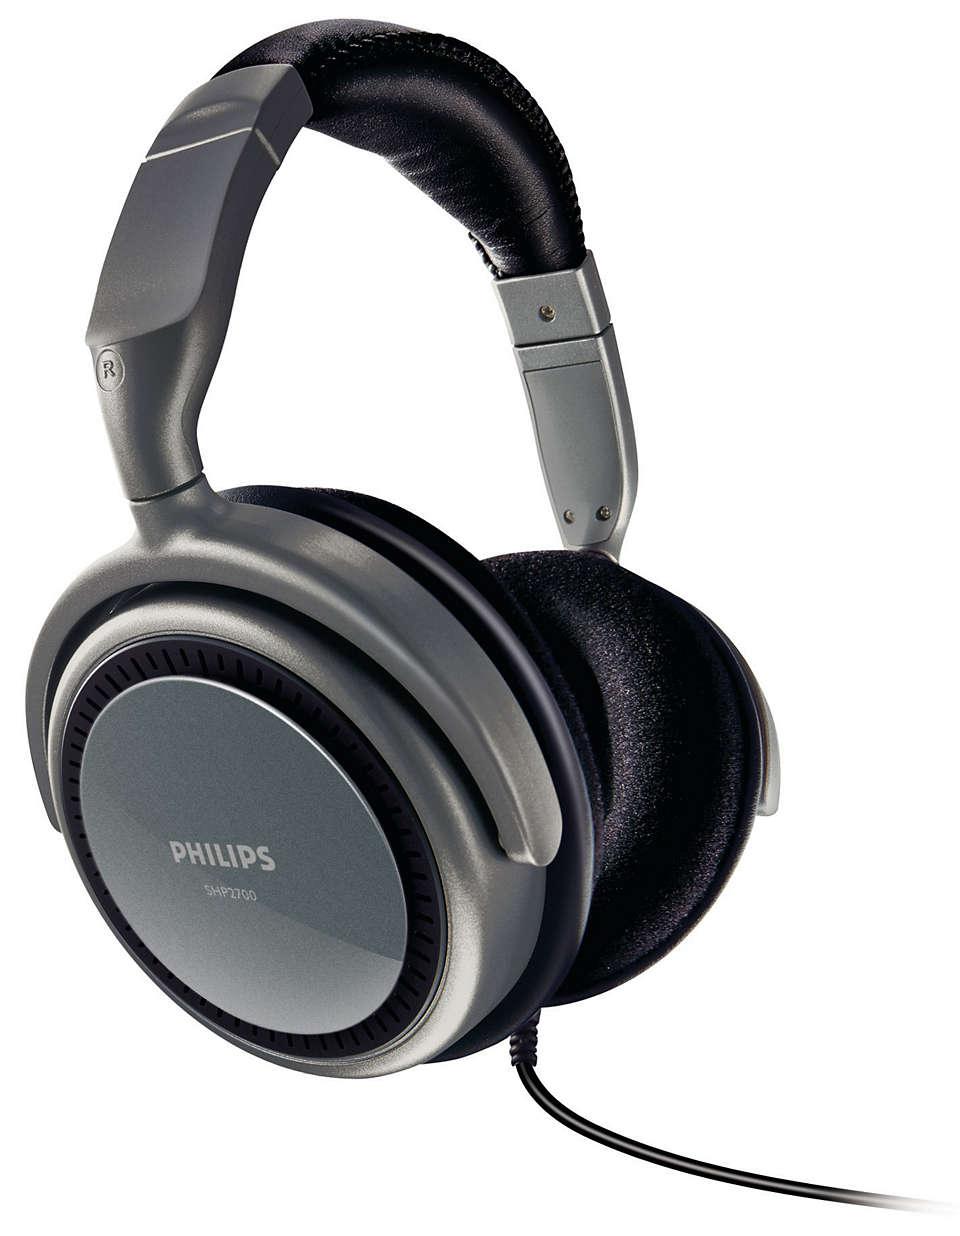 Powerful sound, superb comfort